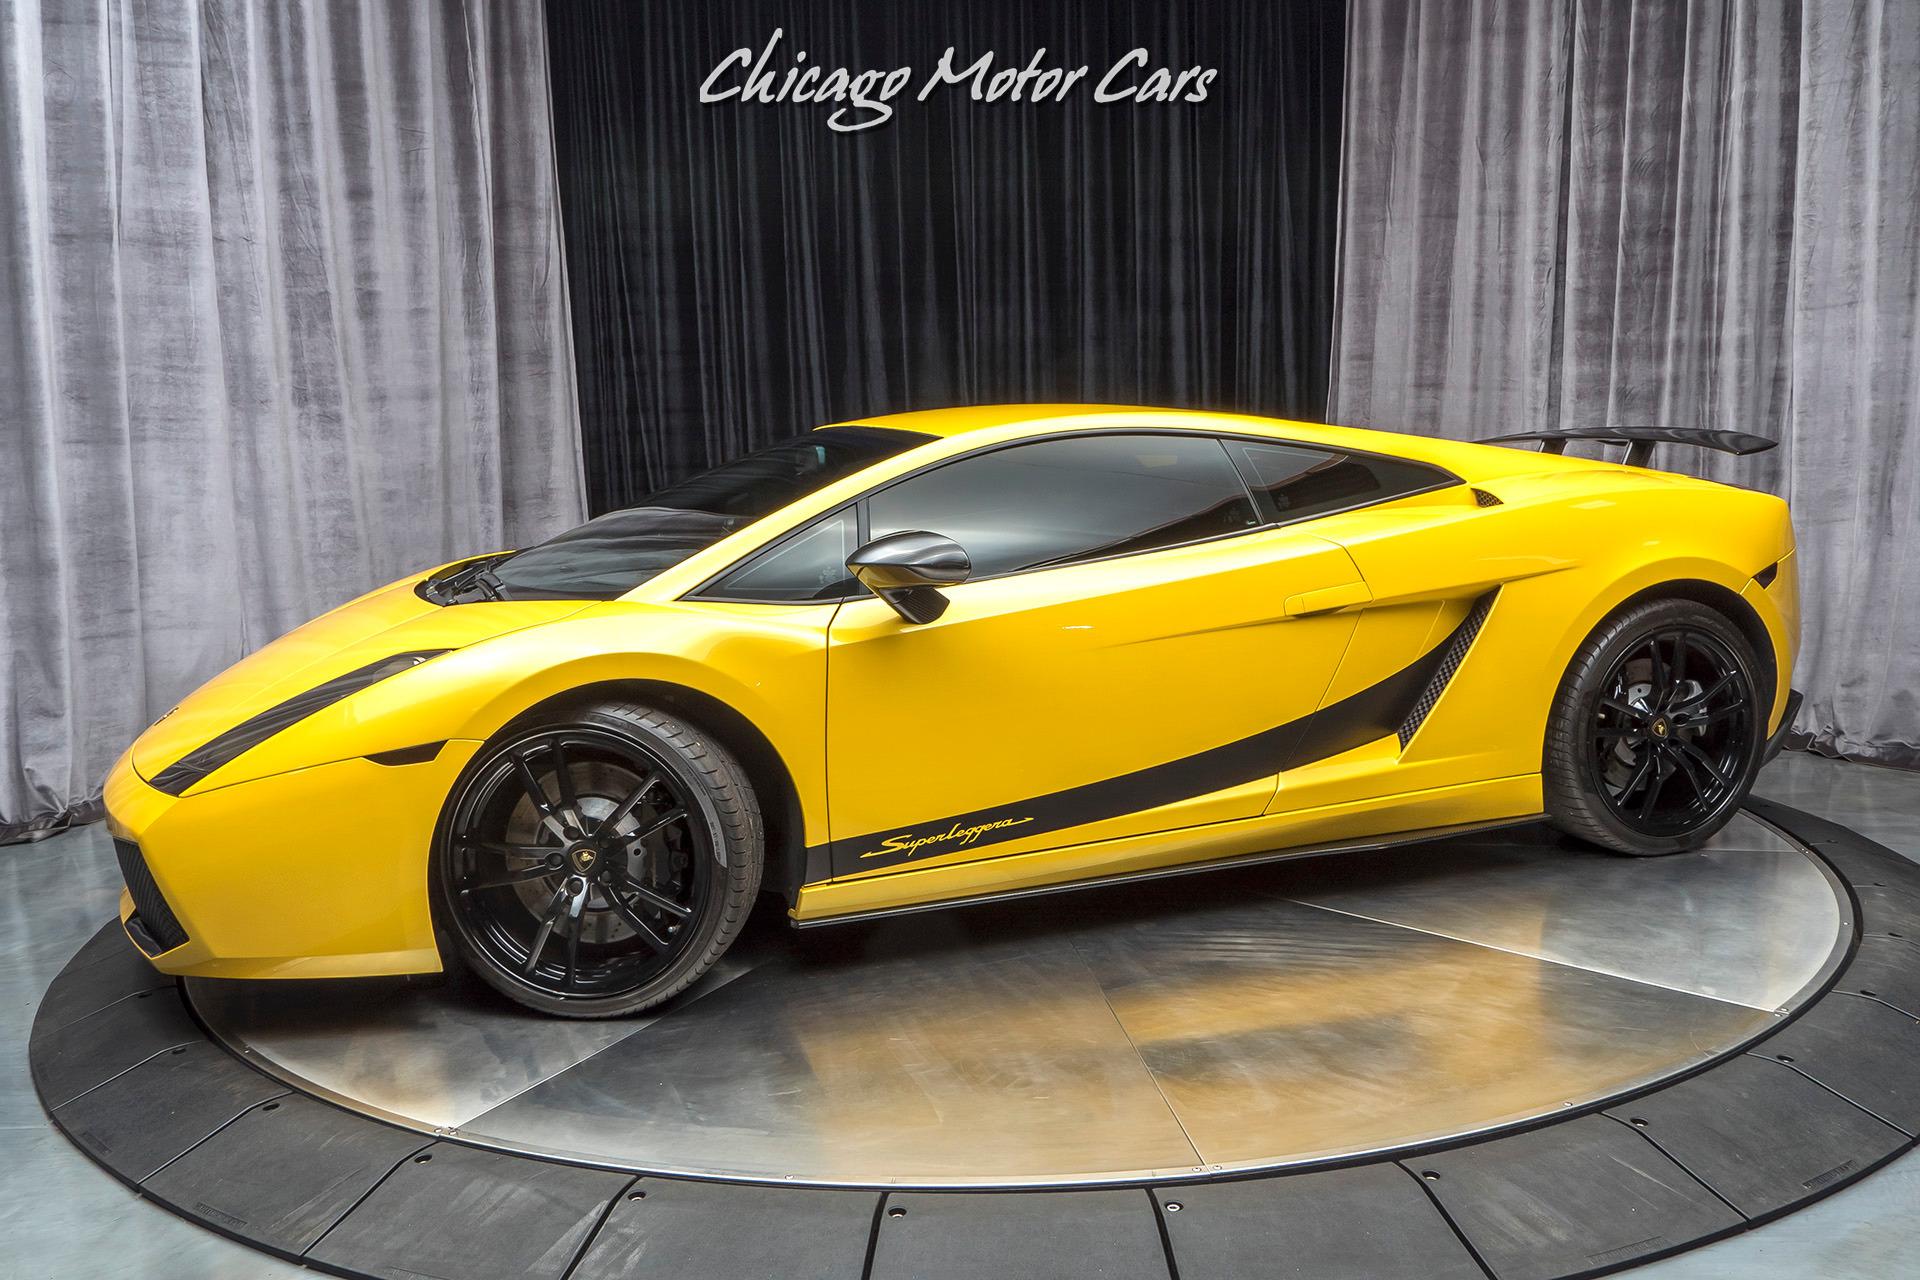 Used-2008-Lamborghini-Gallardo-Superleggera-Coupe-RARE-EXAMPLE-CARBON-FIBER-LOADED